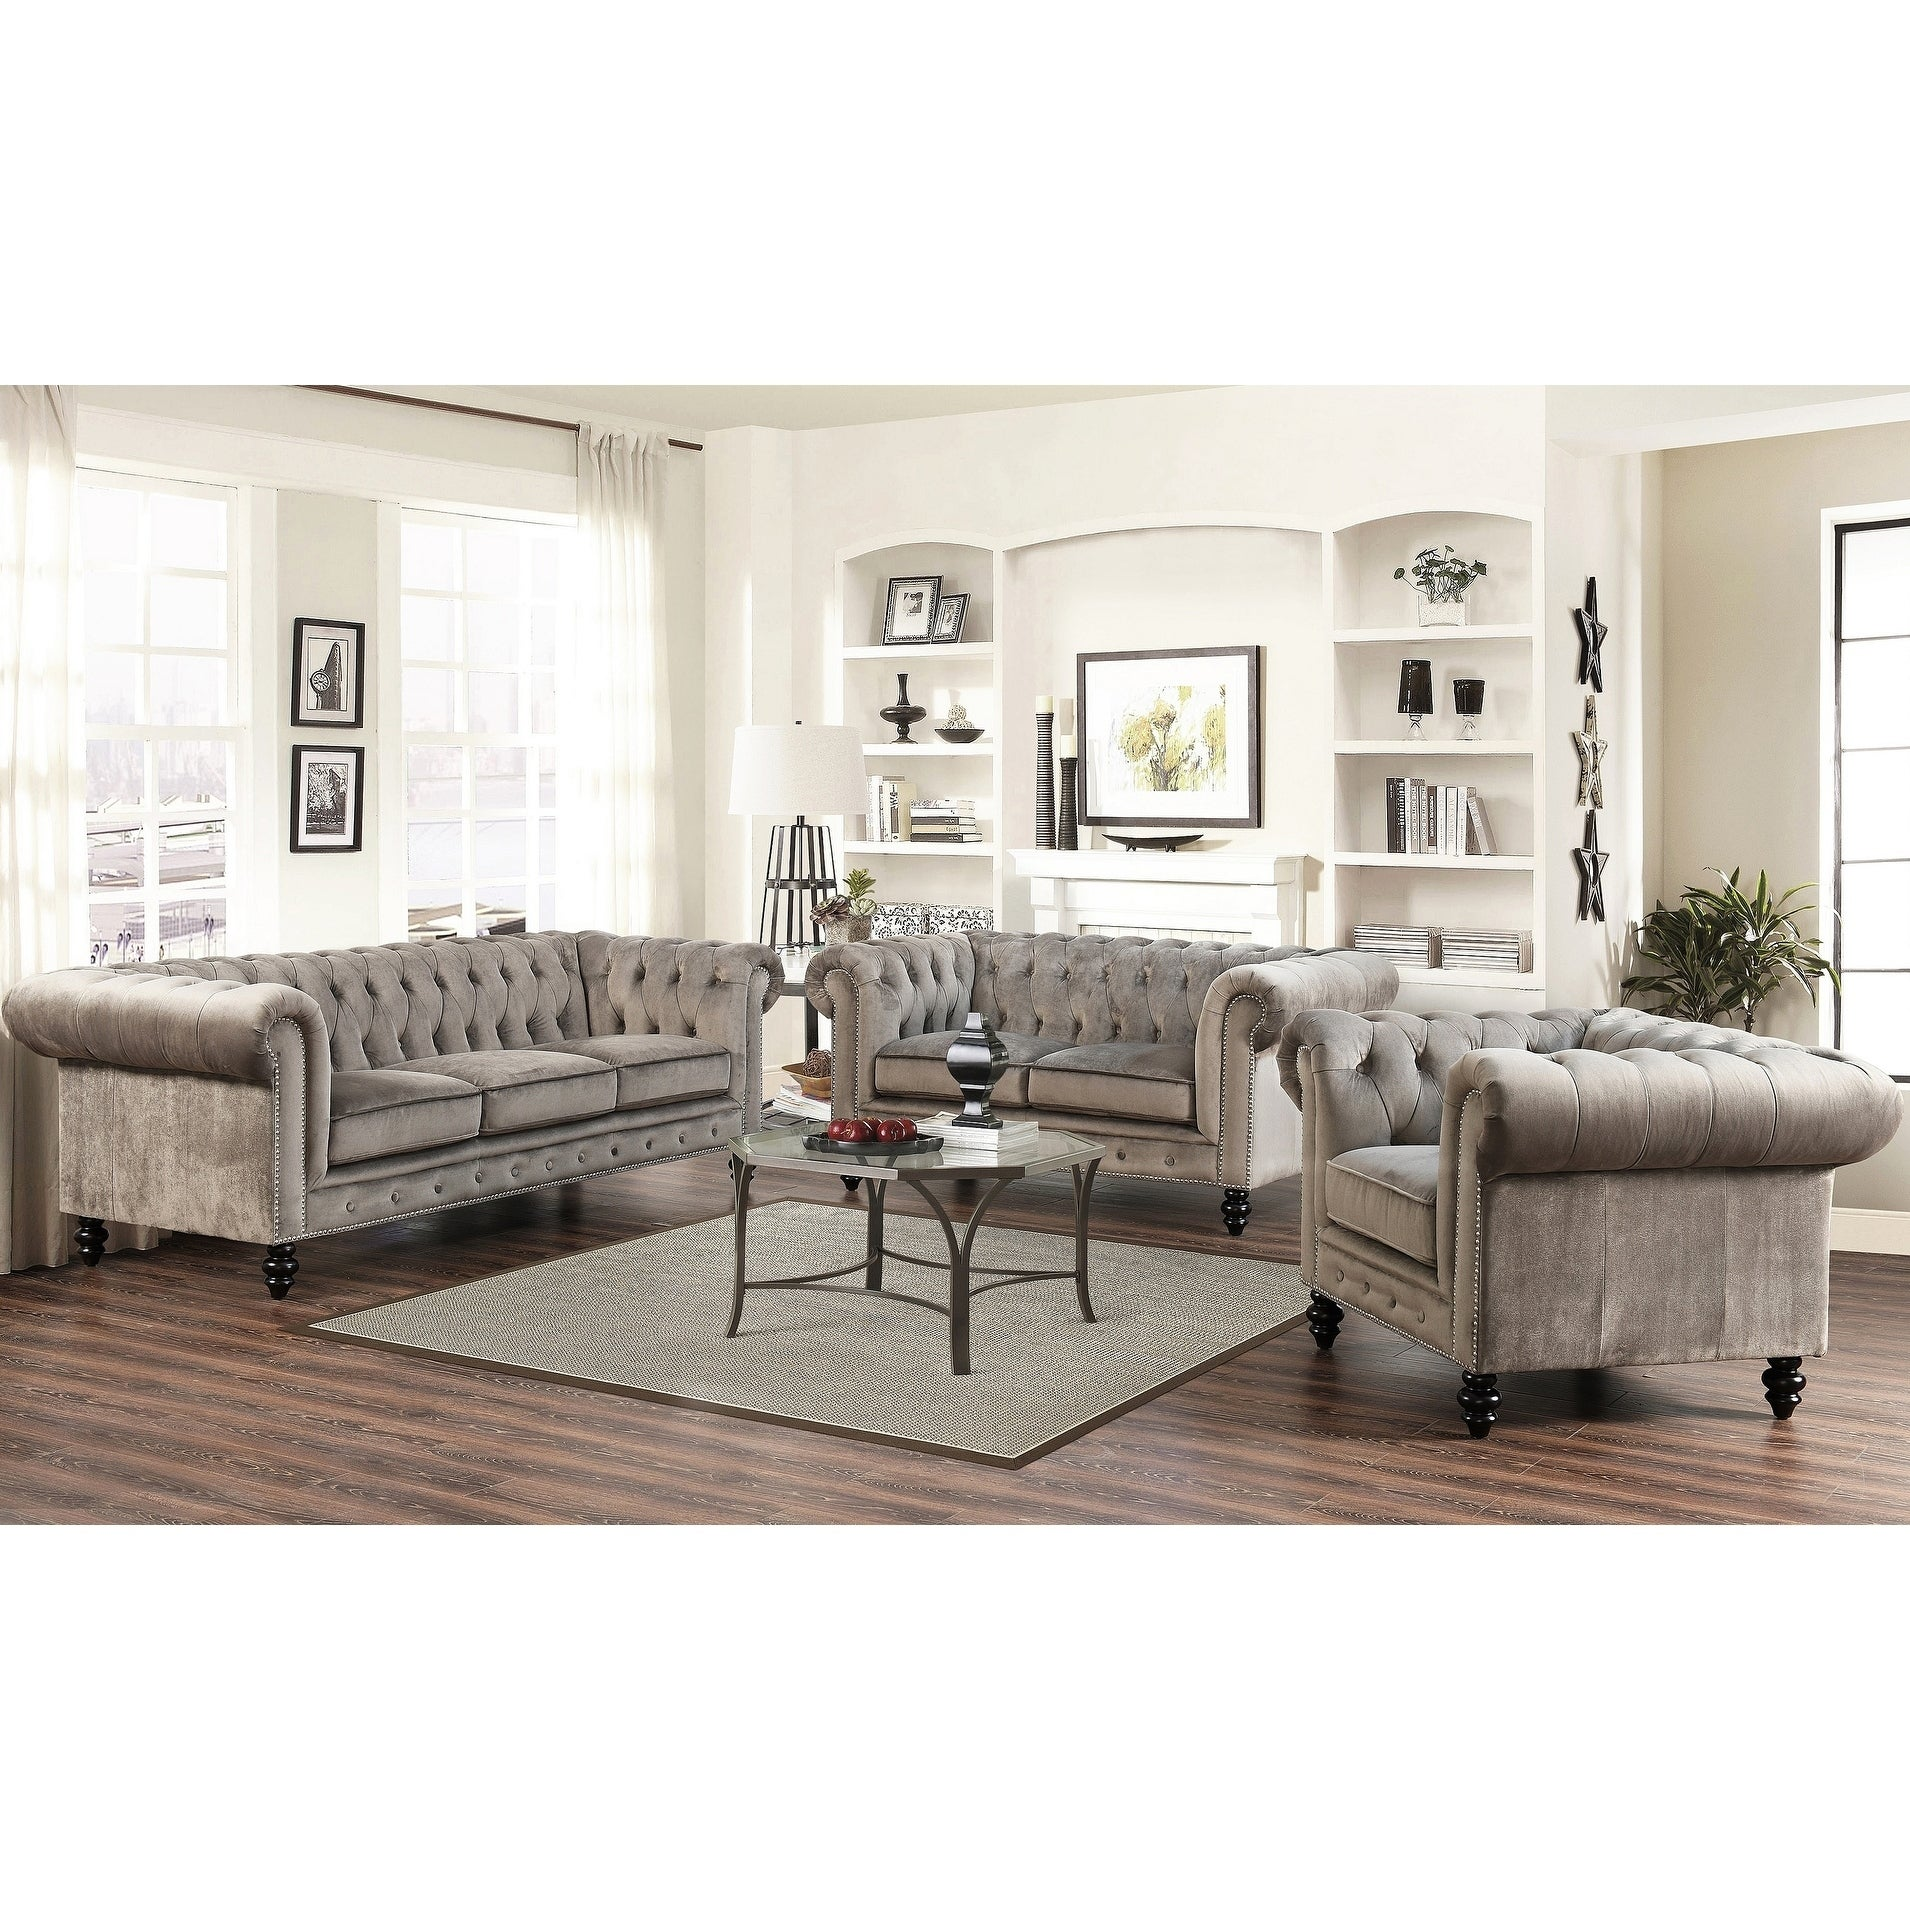 Shop Gracewood Hollow Dib Grey Velvet-3 Piece Living Room Set - On ...